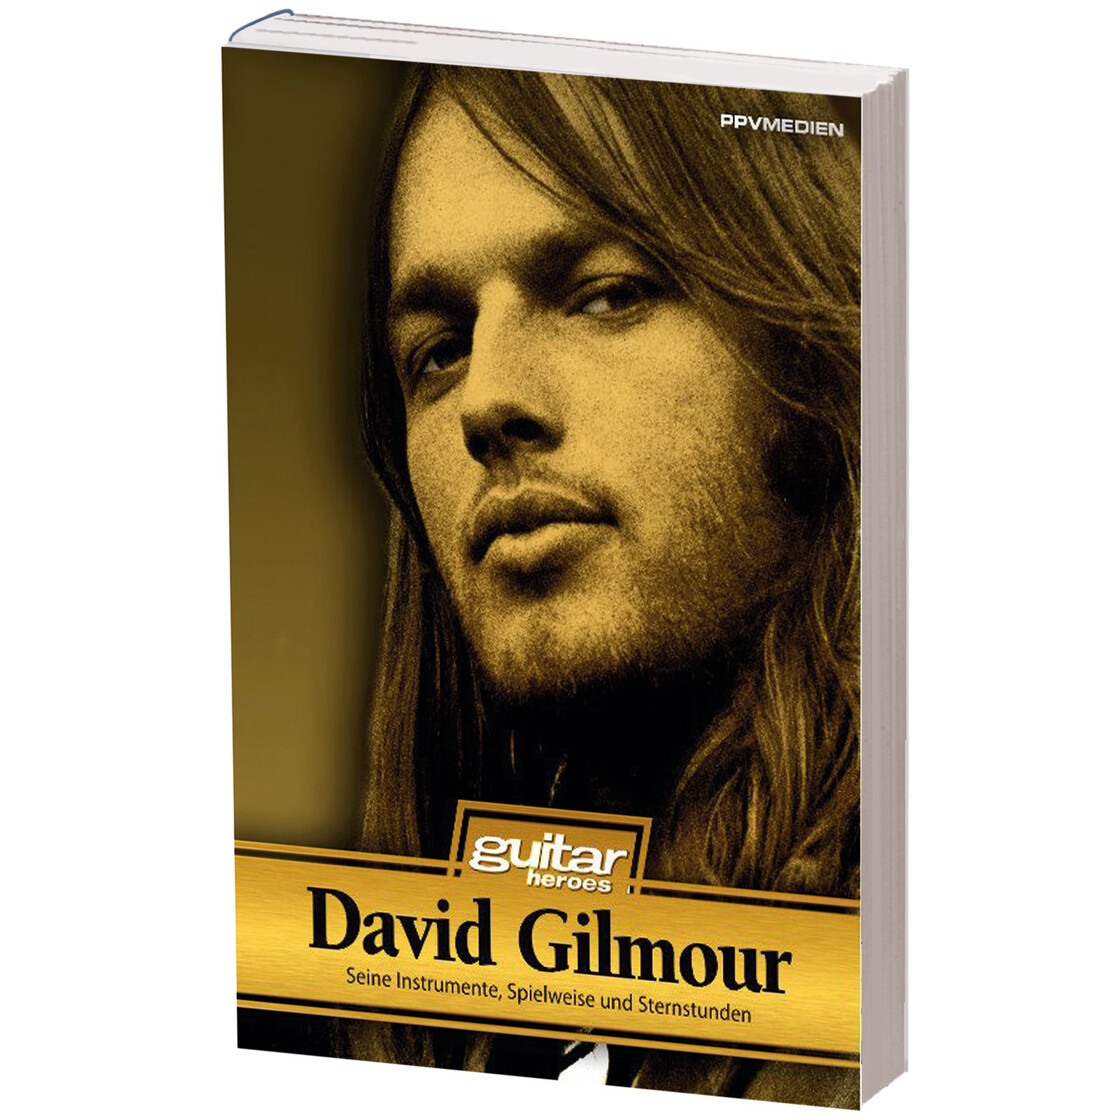 Guitar Heros David Gilmour